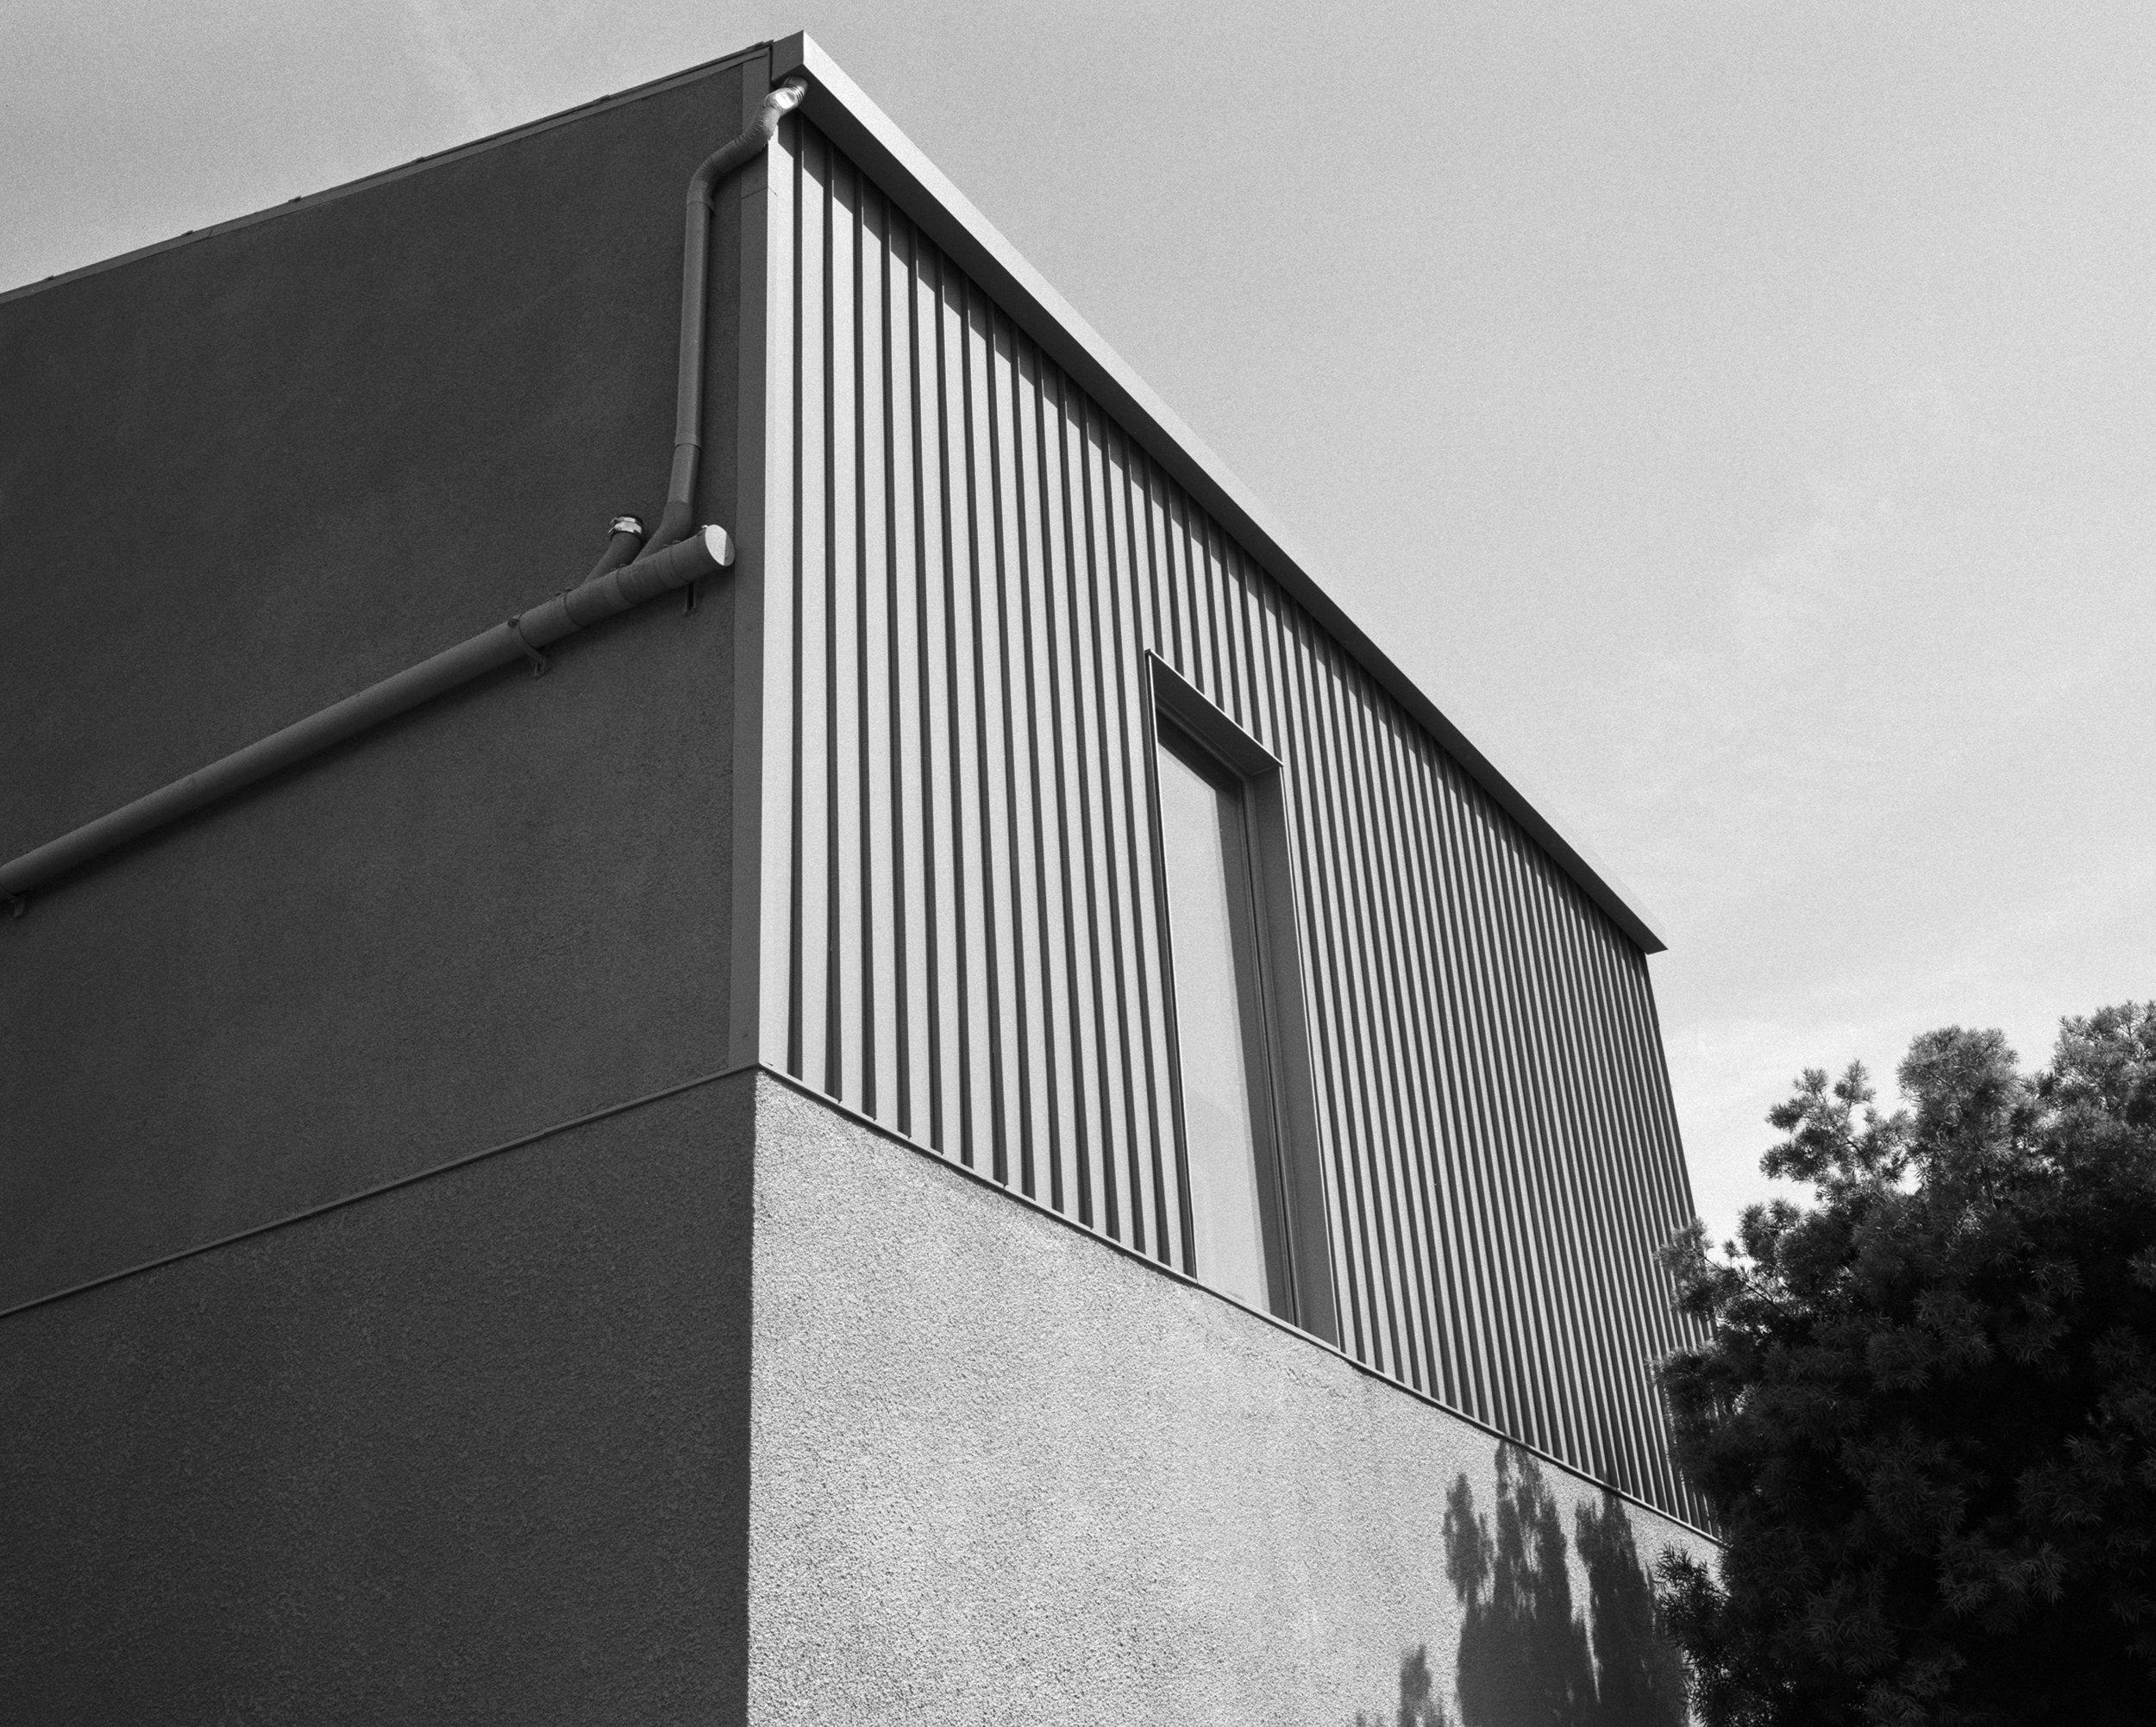 FAIRFAX APRIL 2019 -edit house with ripplesSQ.jpg